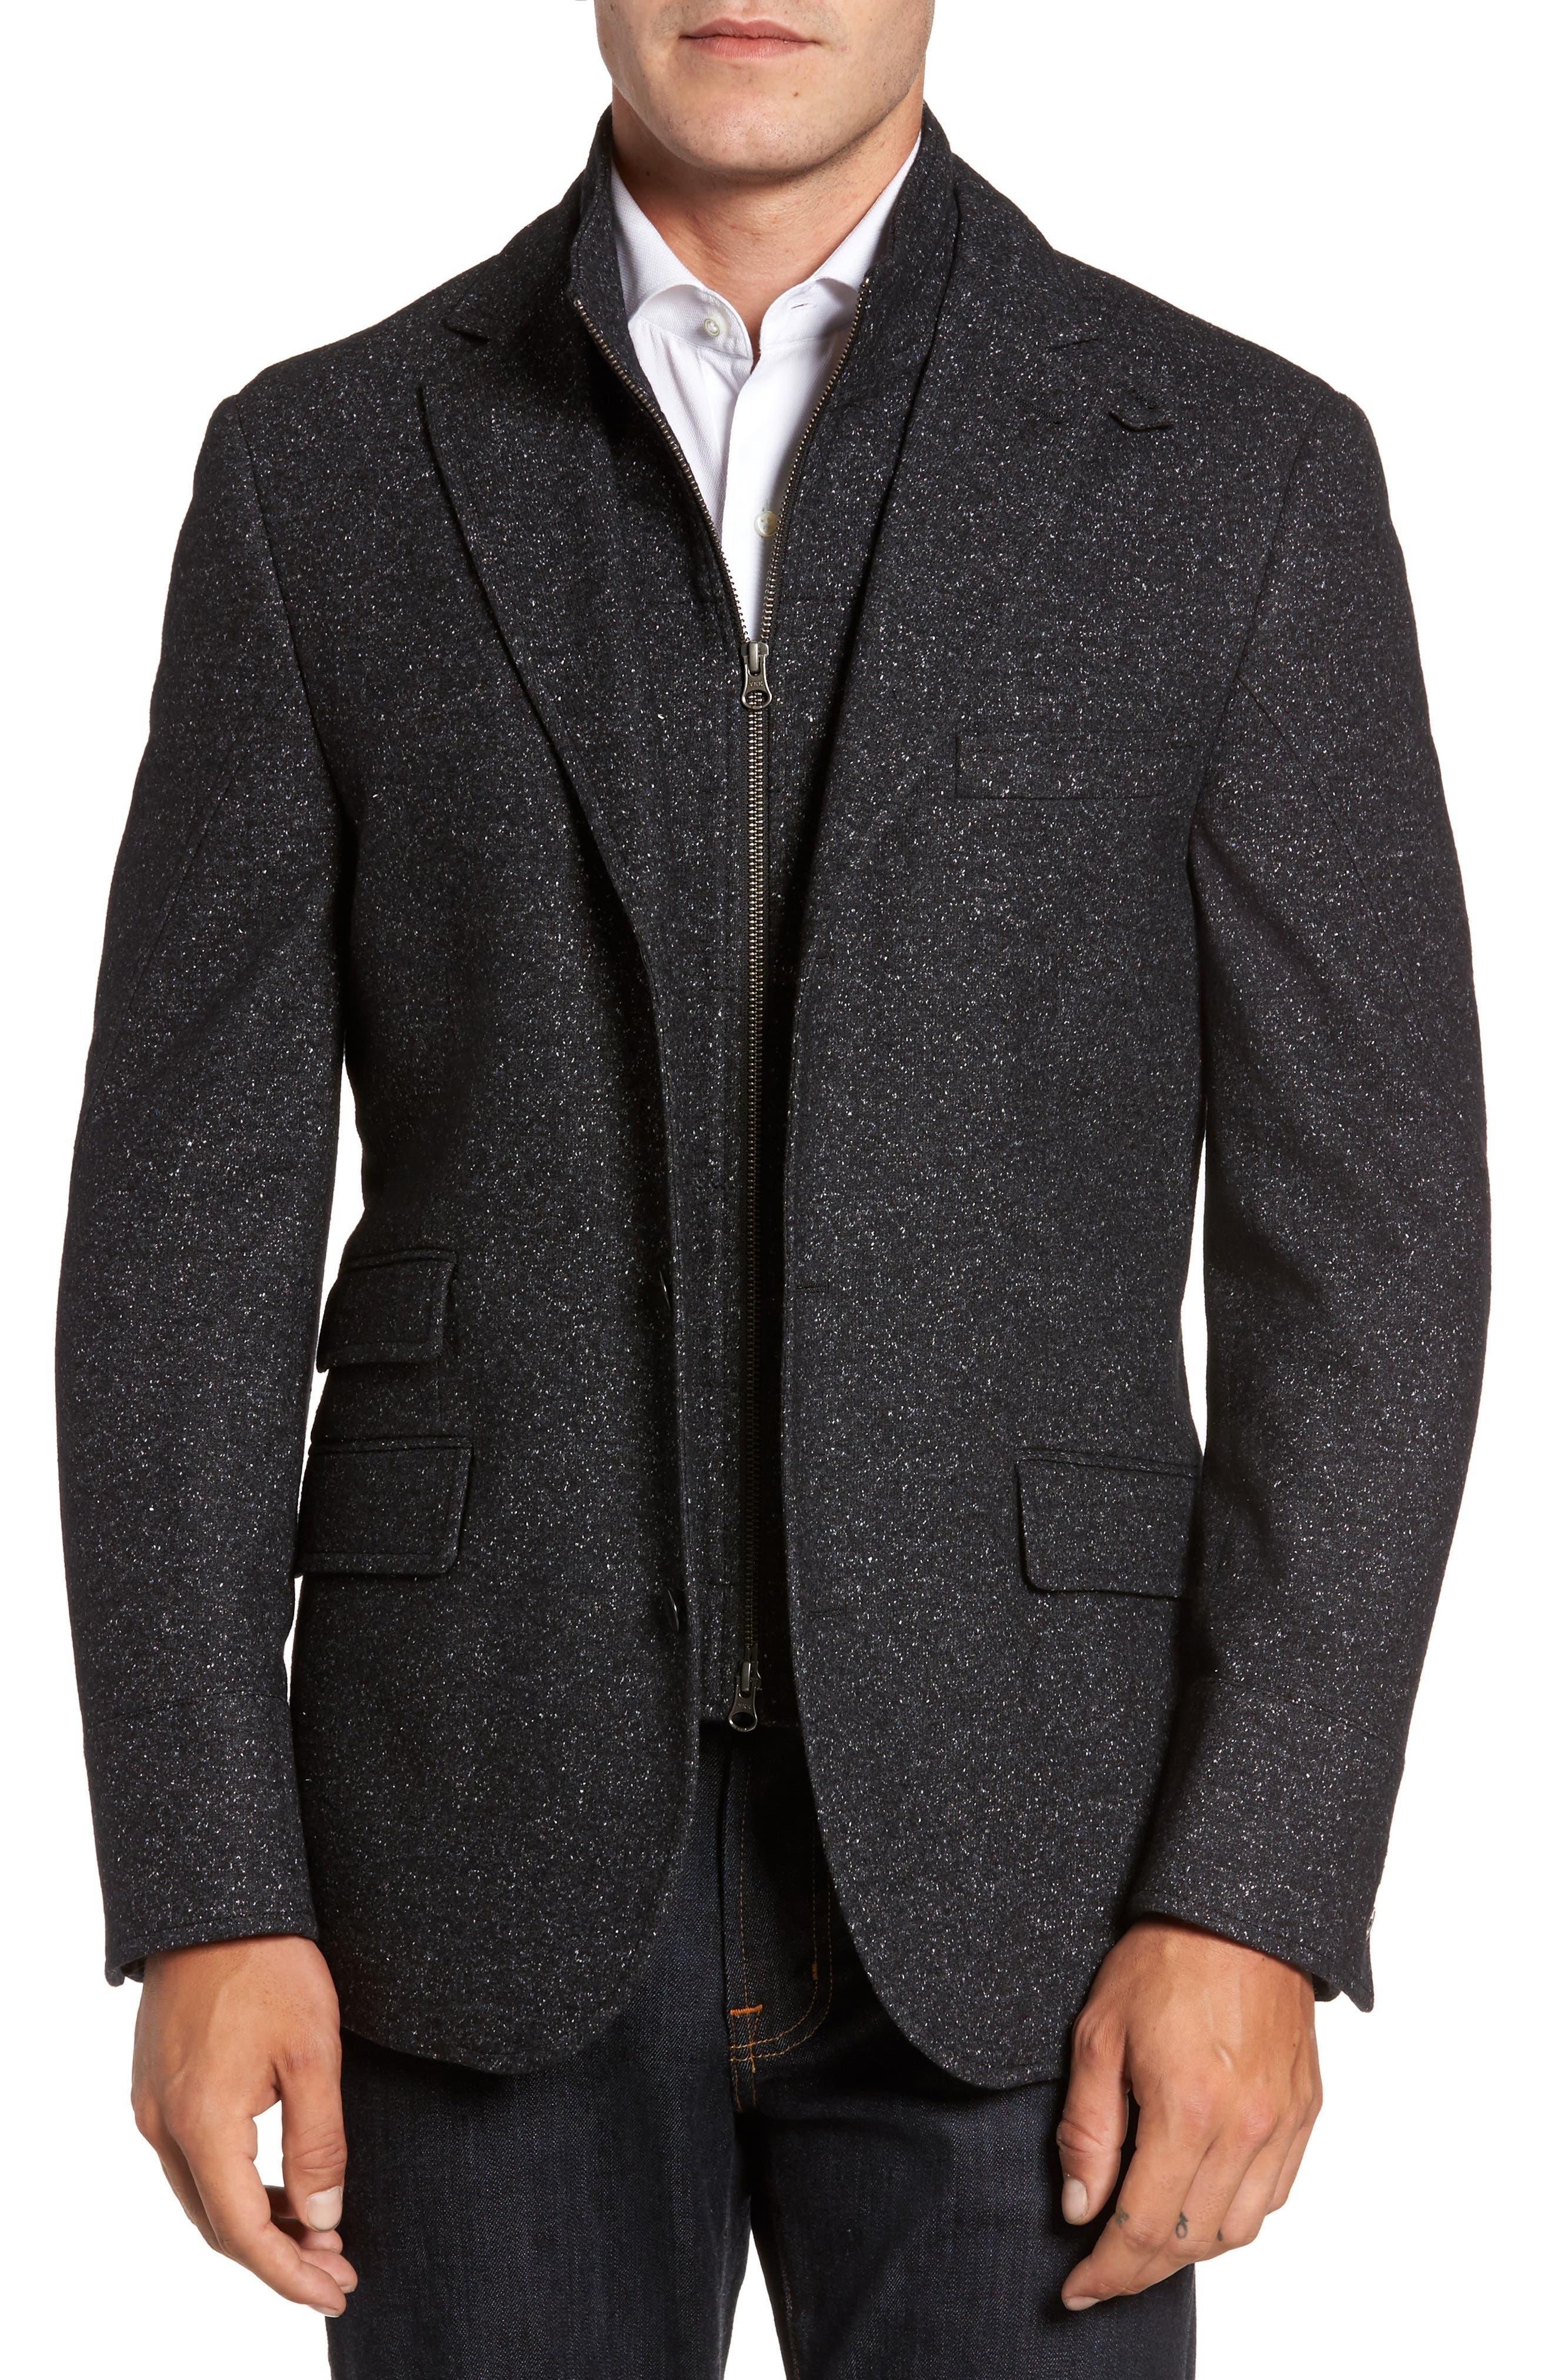 Alternate Image 1 Selected - FLYNT Donegal Wool Blend Hybrid Coat